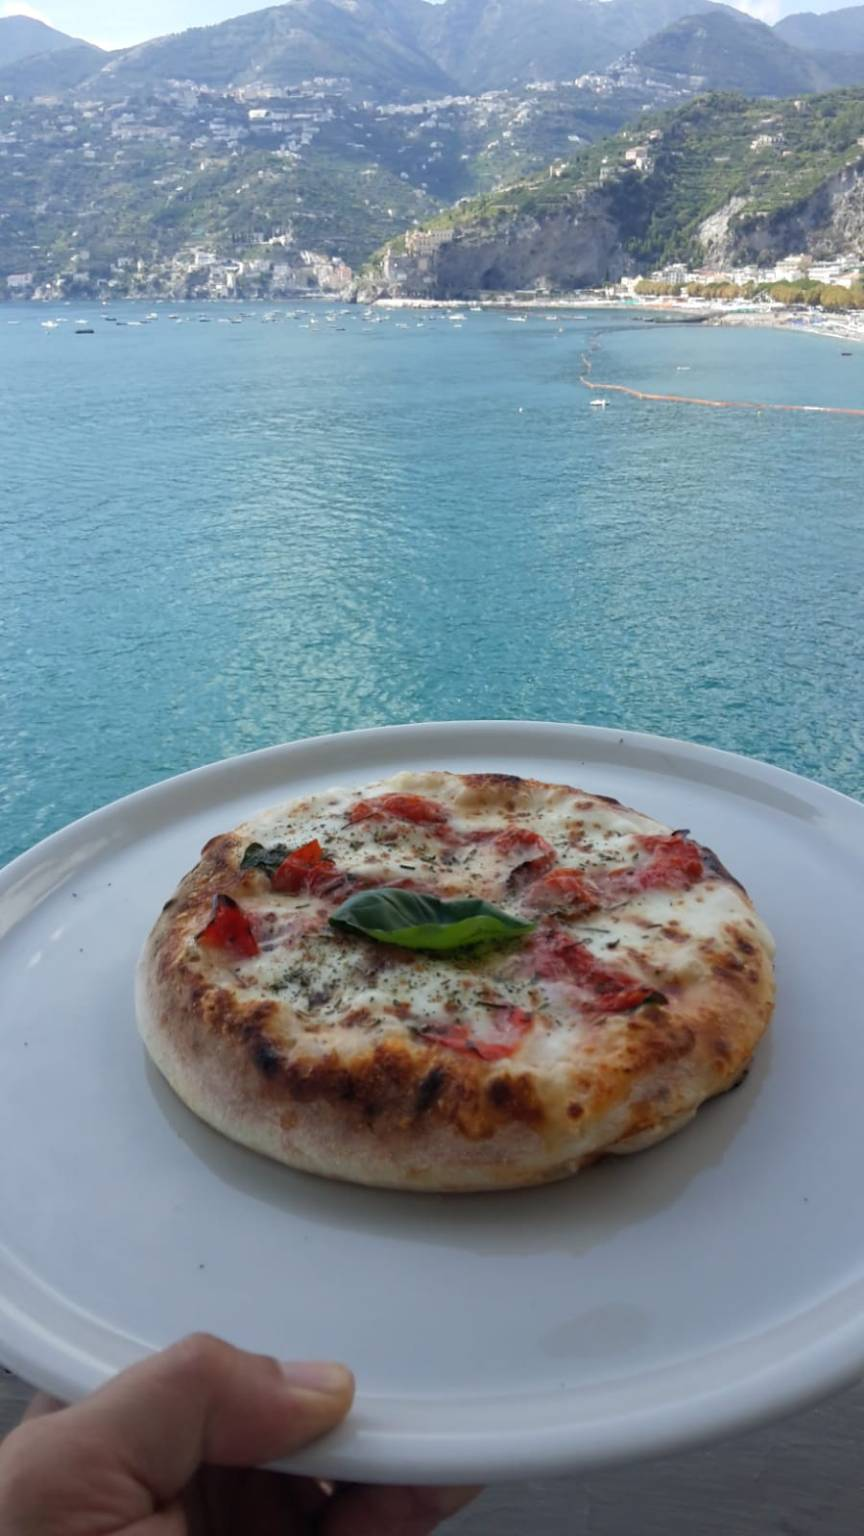 Tramonti pizza Giuseppe Giordano Nathan Myhrvold